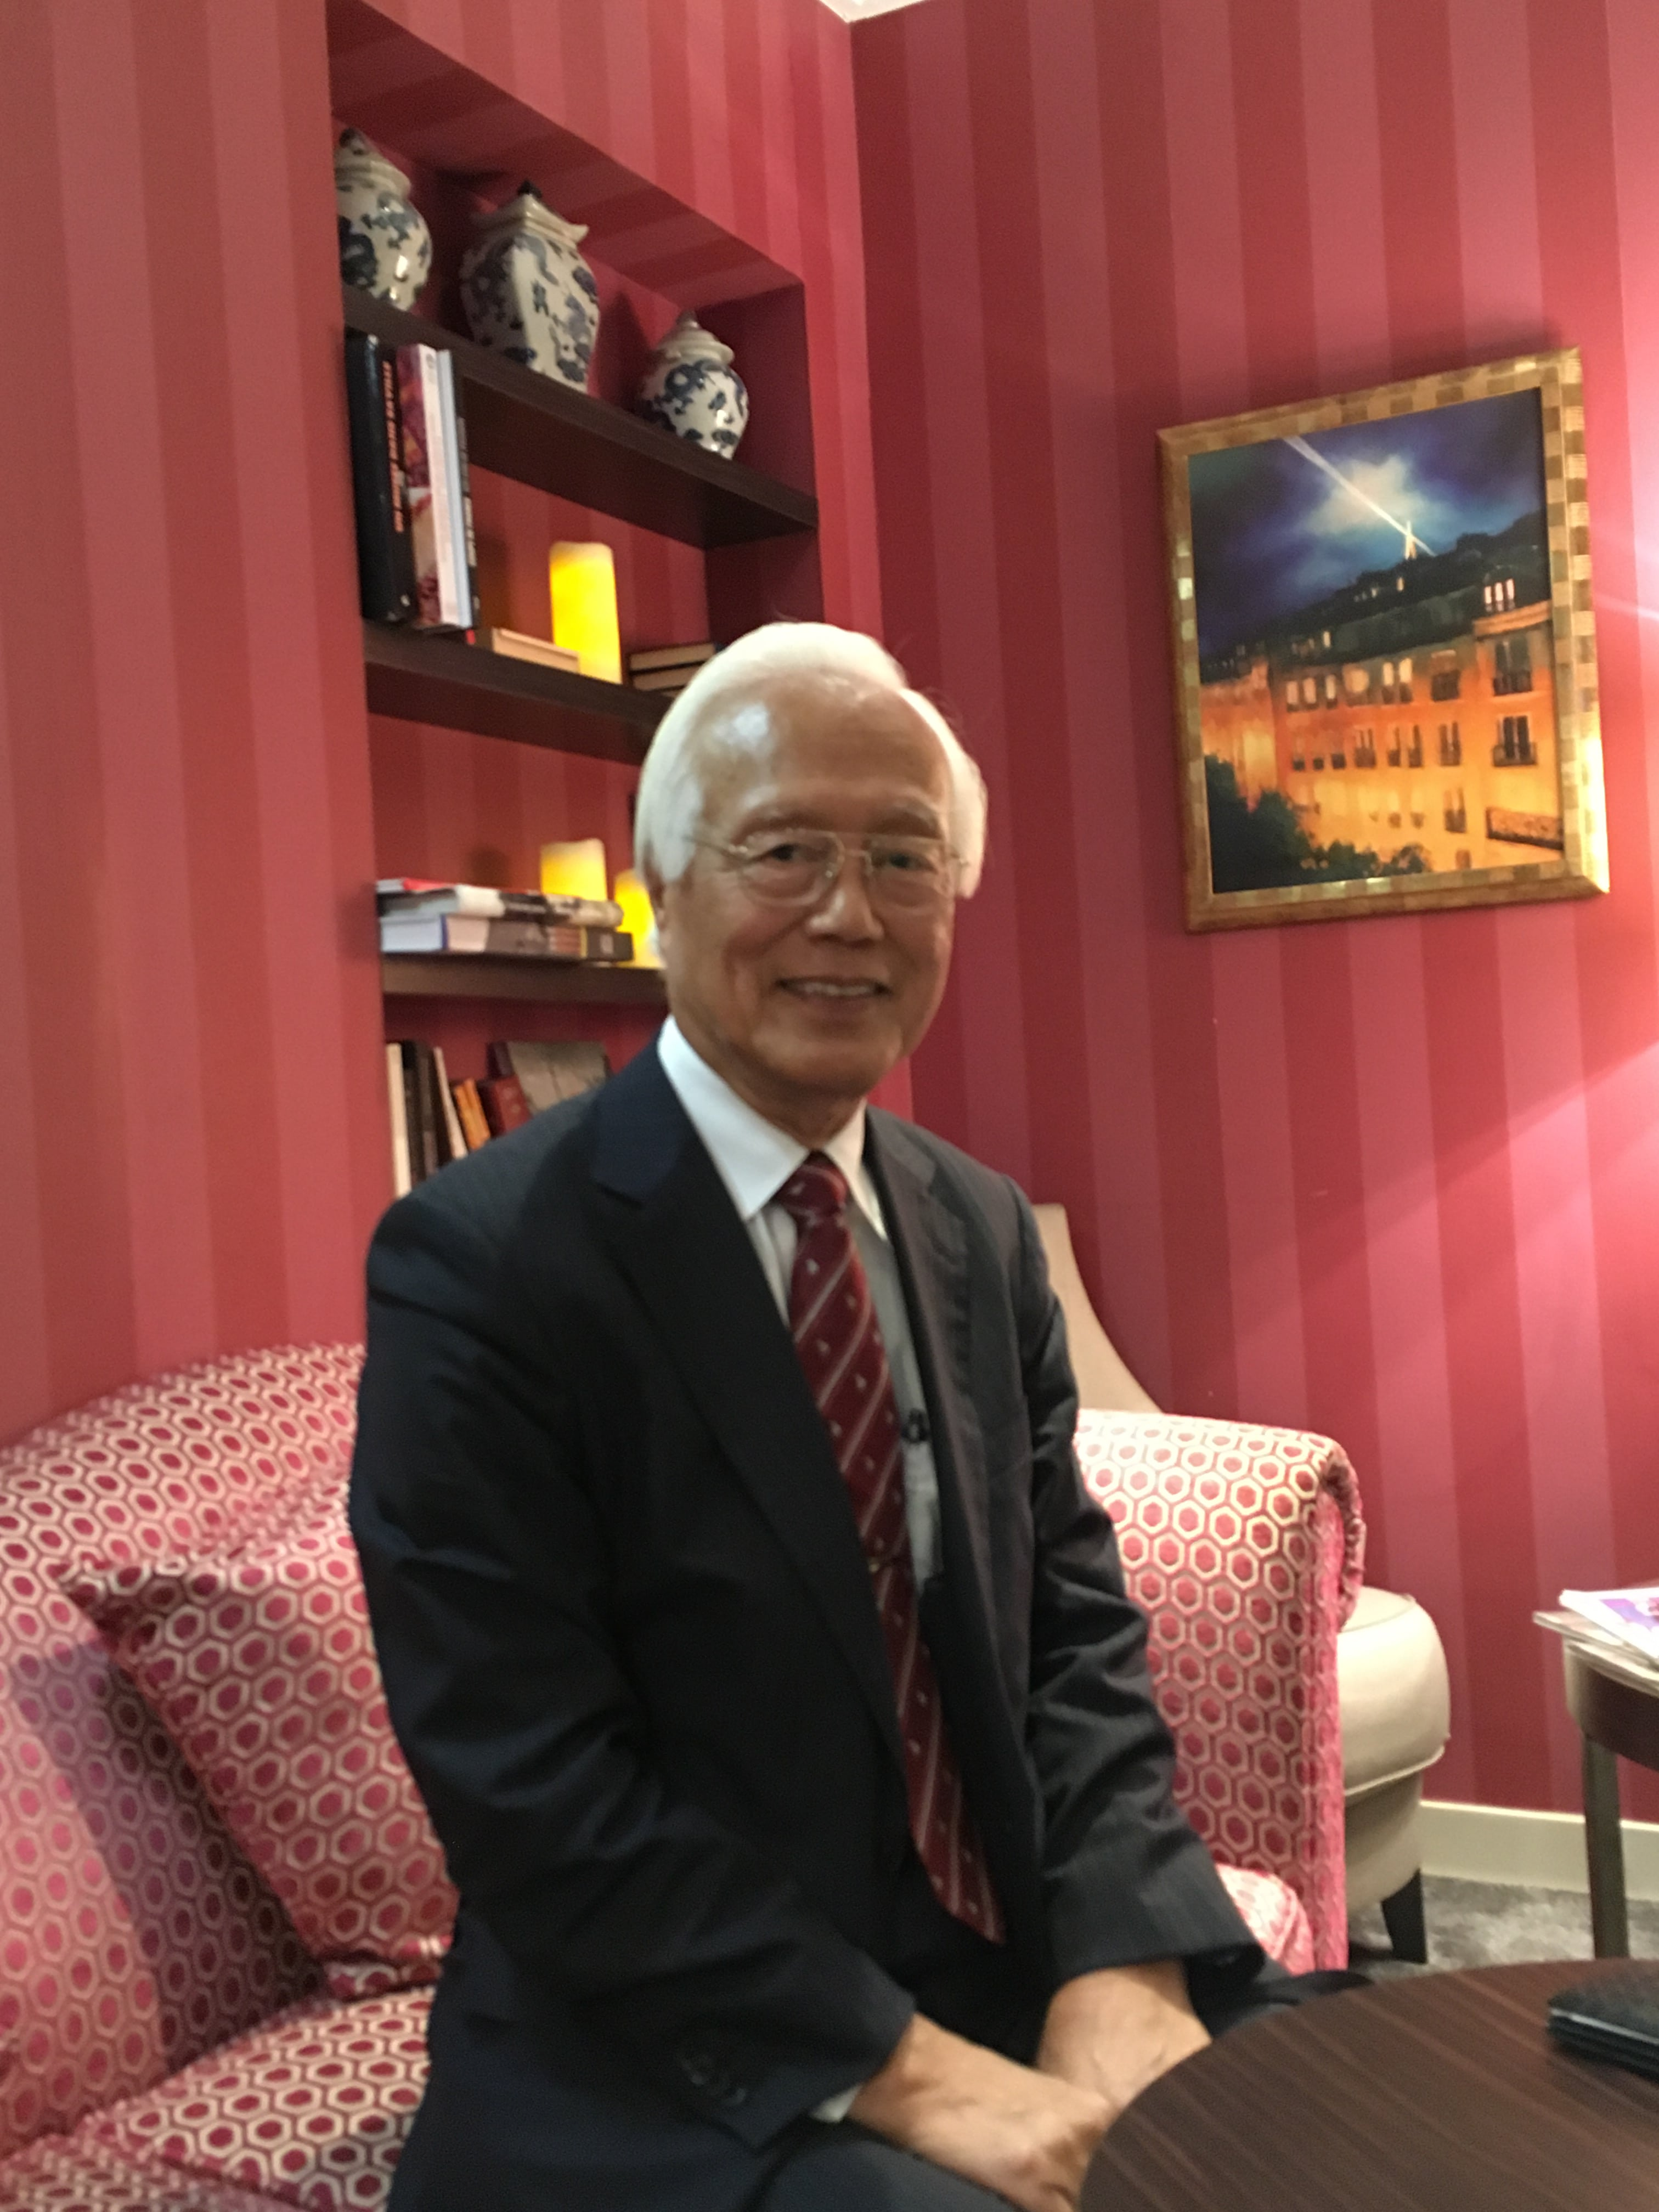 Teavoyages_Professor_Masashi_Omori_Paris_2018